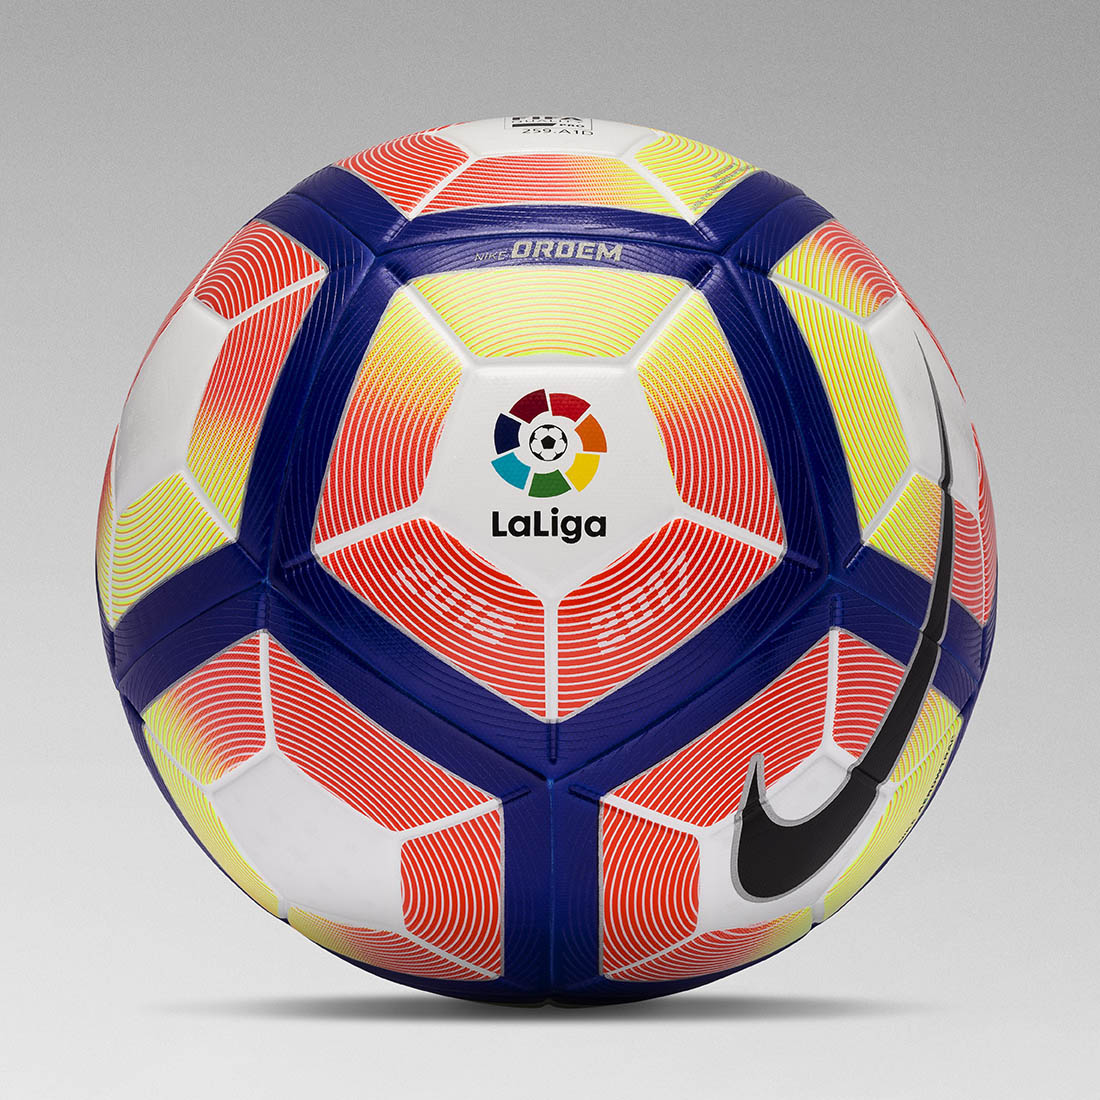 Fußball La Liga